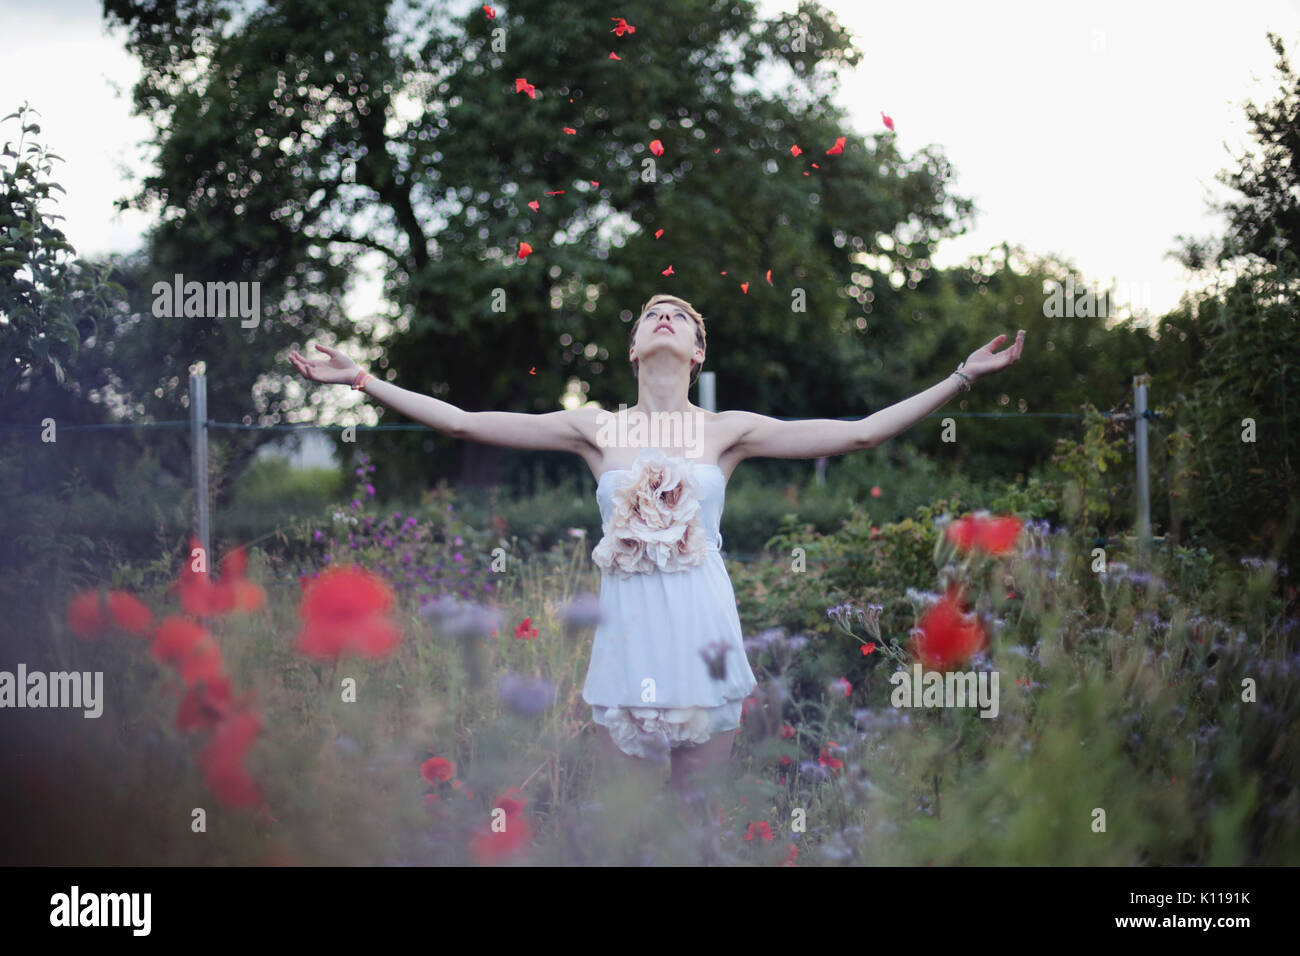 Junge Frau wirft Blütenblätter Stockbild